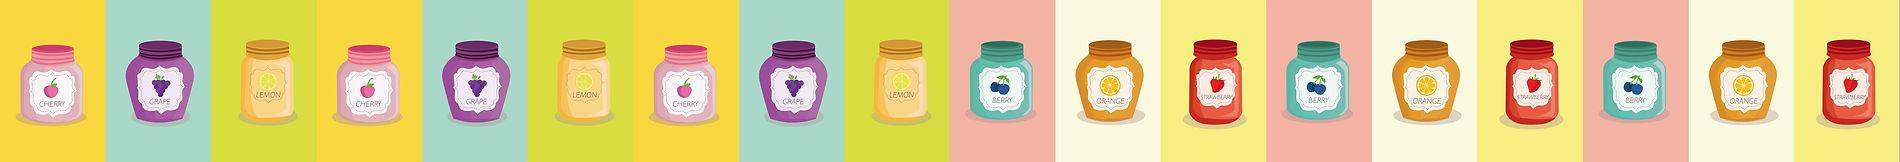 banner-jars.jpg